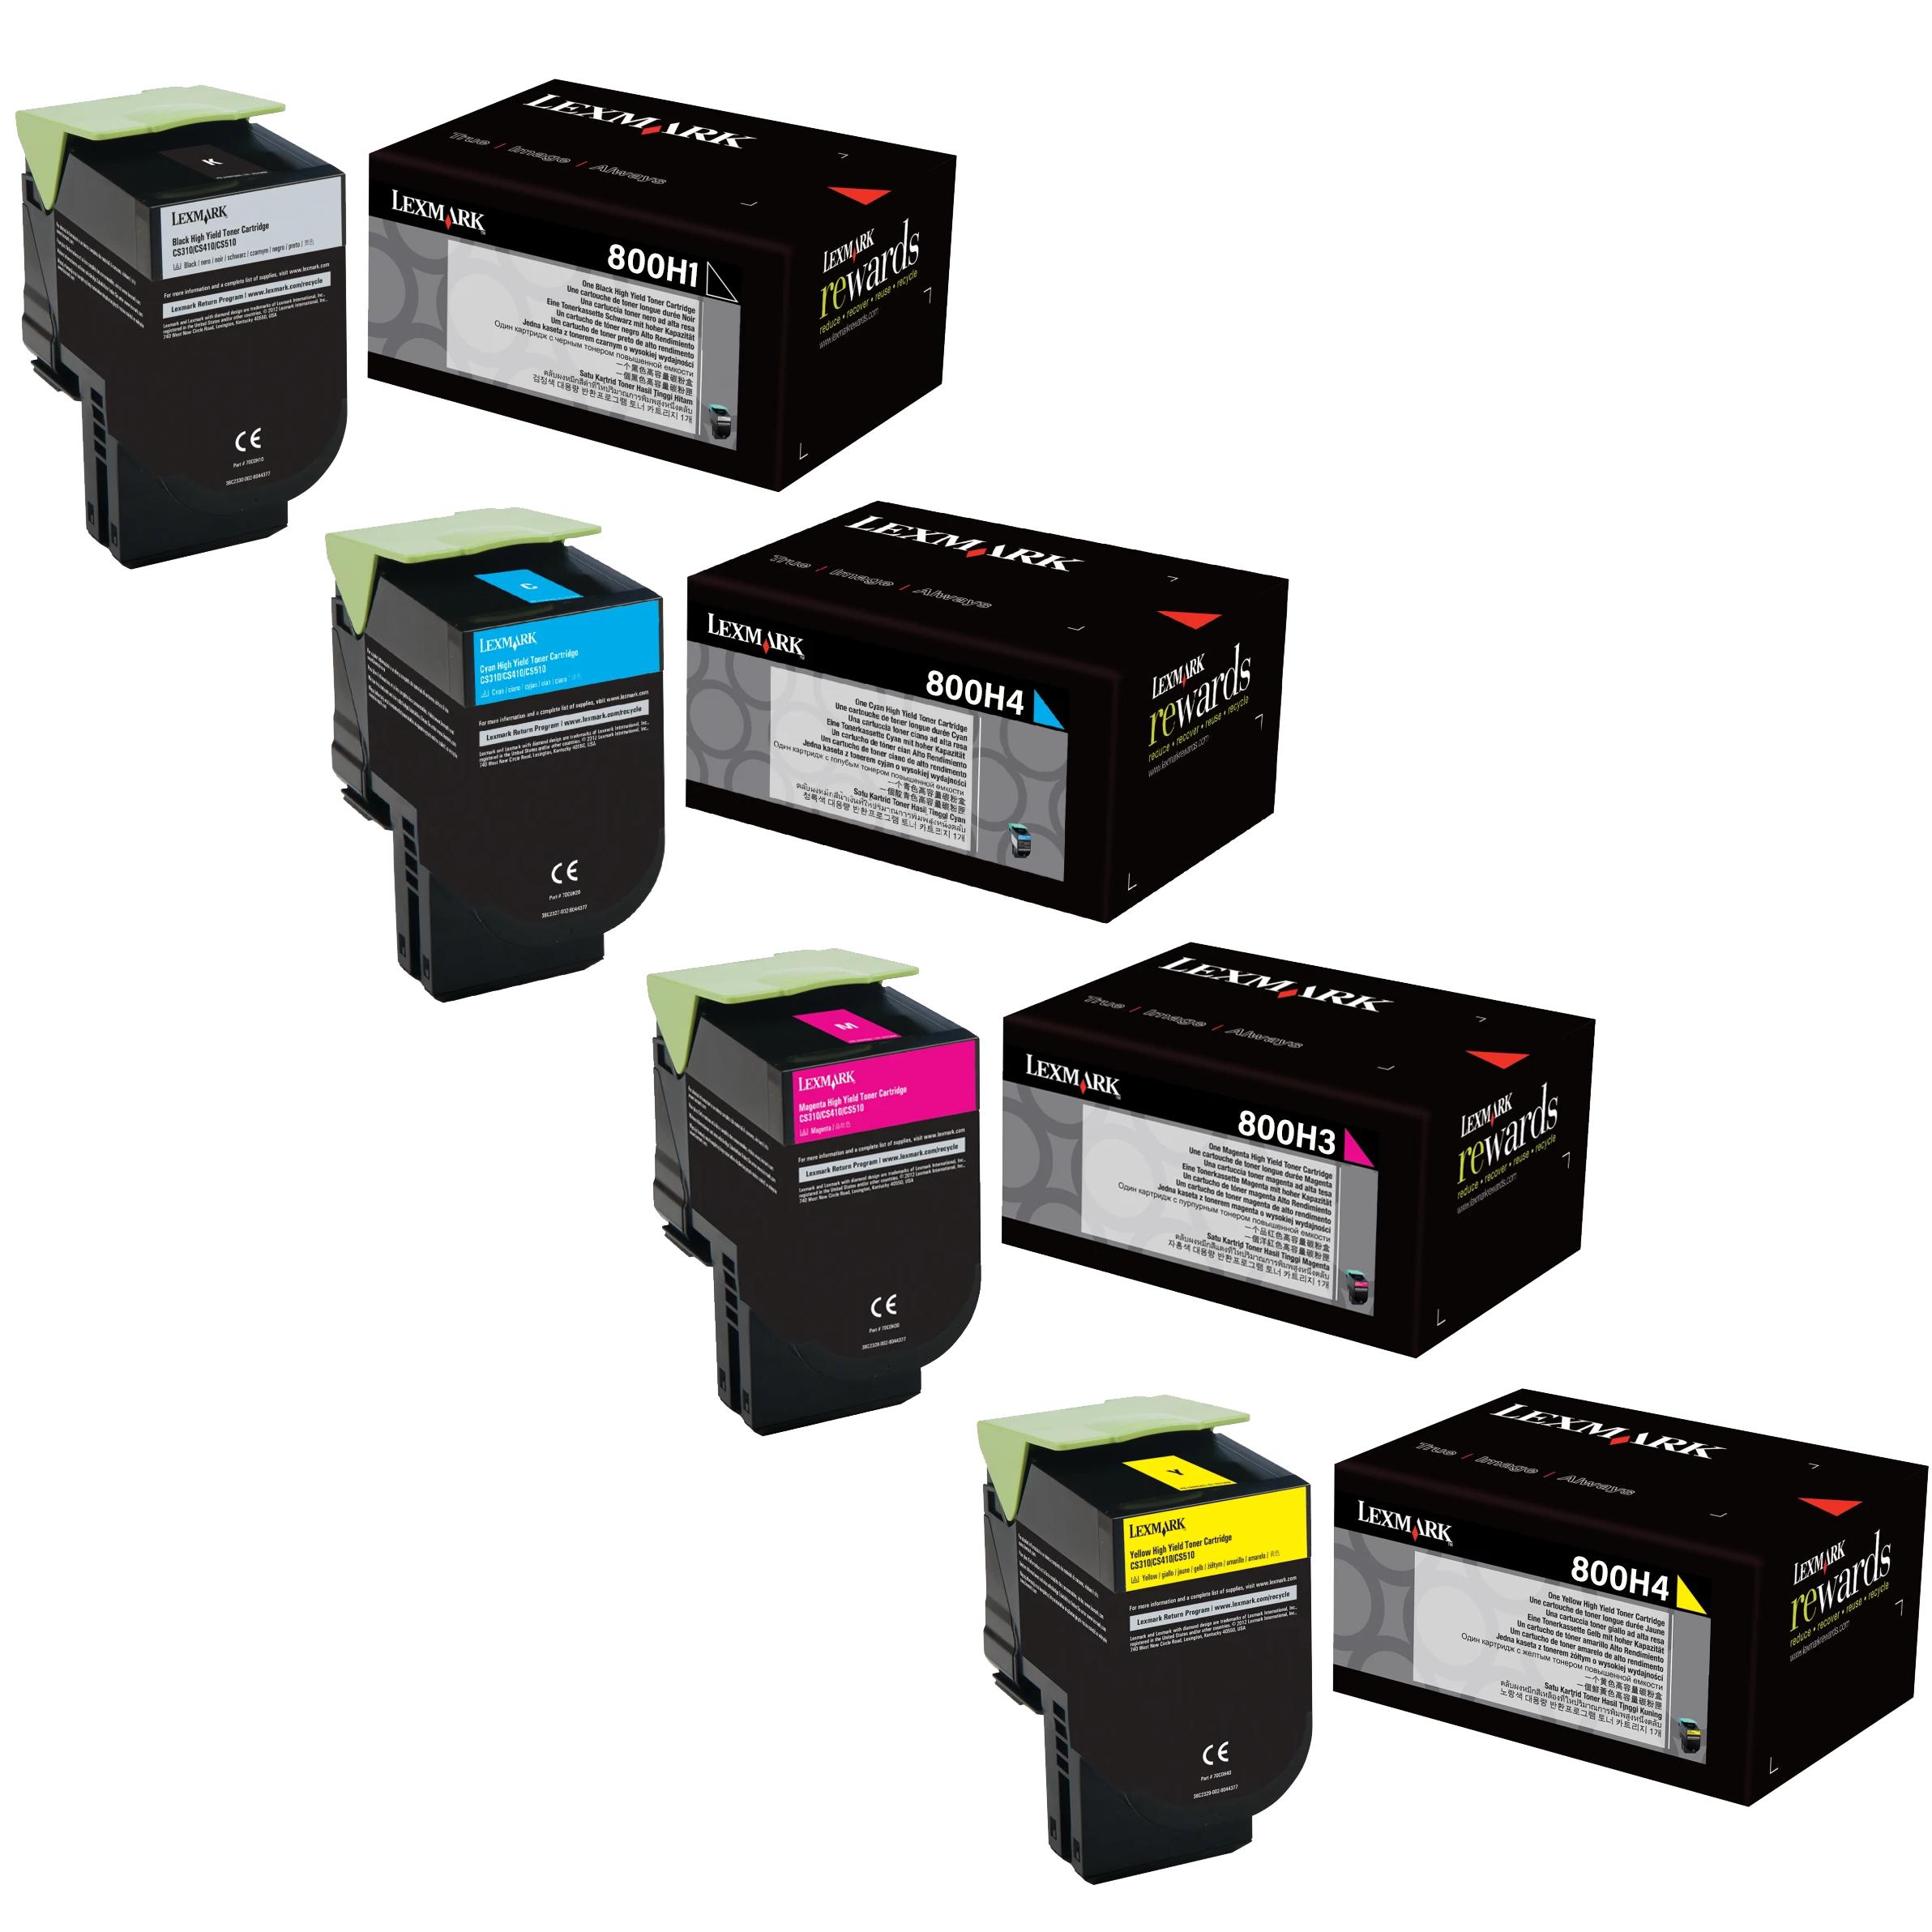 Lexmark 80C0H Set | 80C0H10 80C0H20 80C0H30 80C0H40 | Original Lexmark High-Yield Toner Cartridges – Black, Cyan, Magenta, Yellow